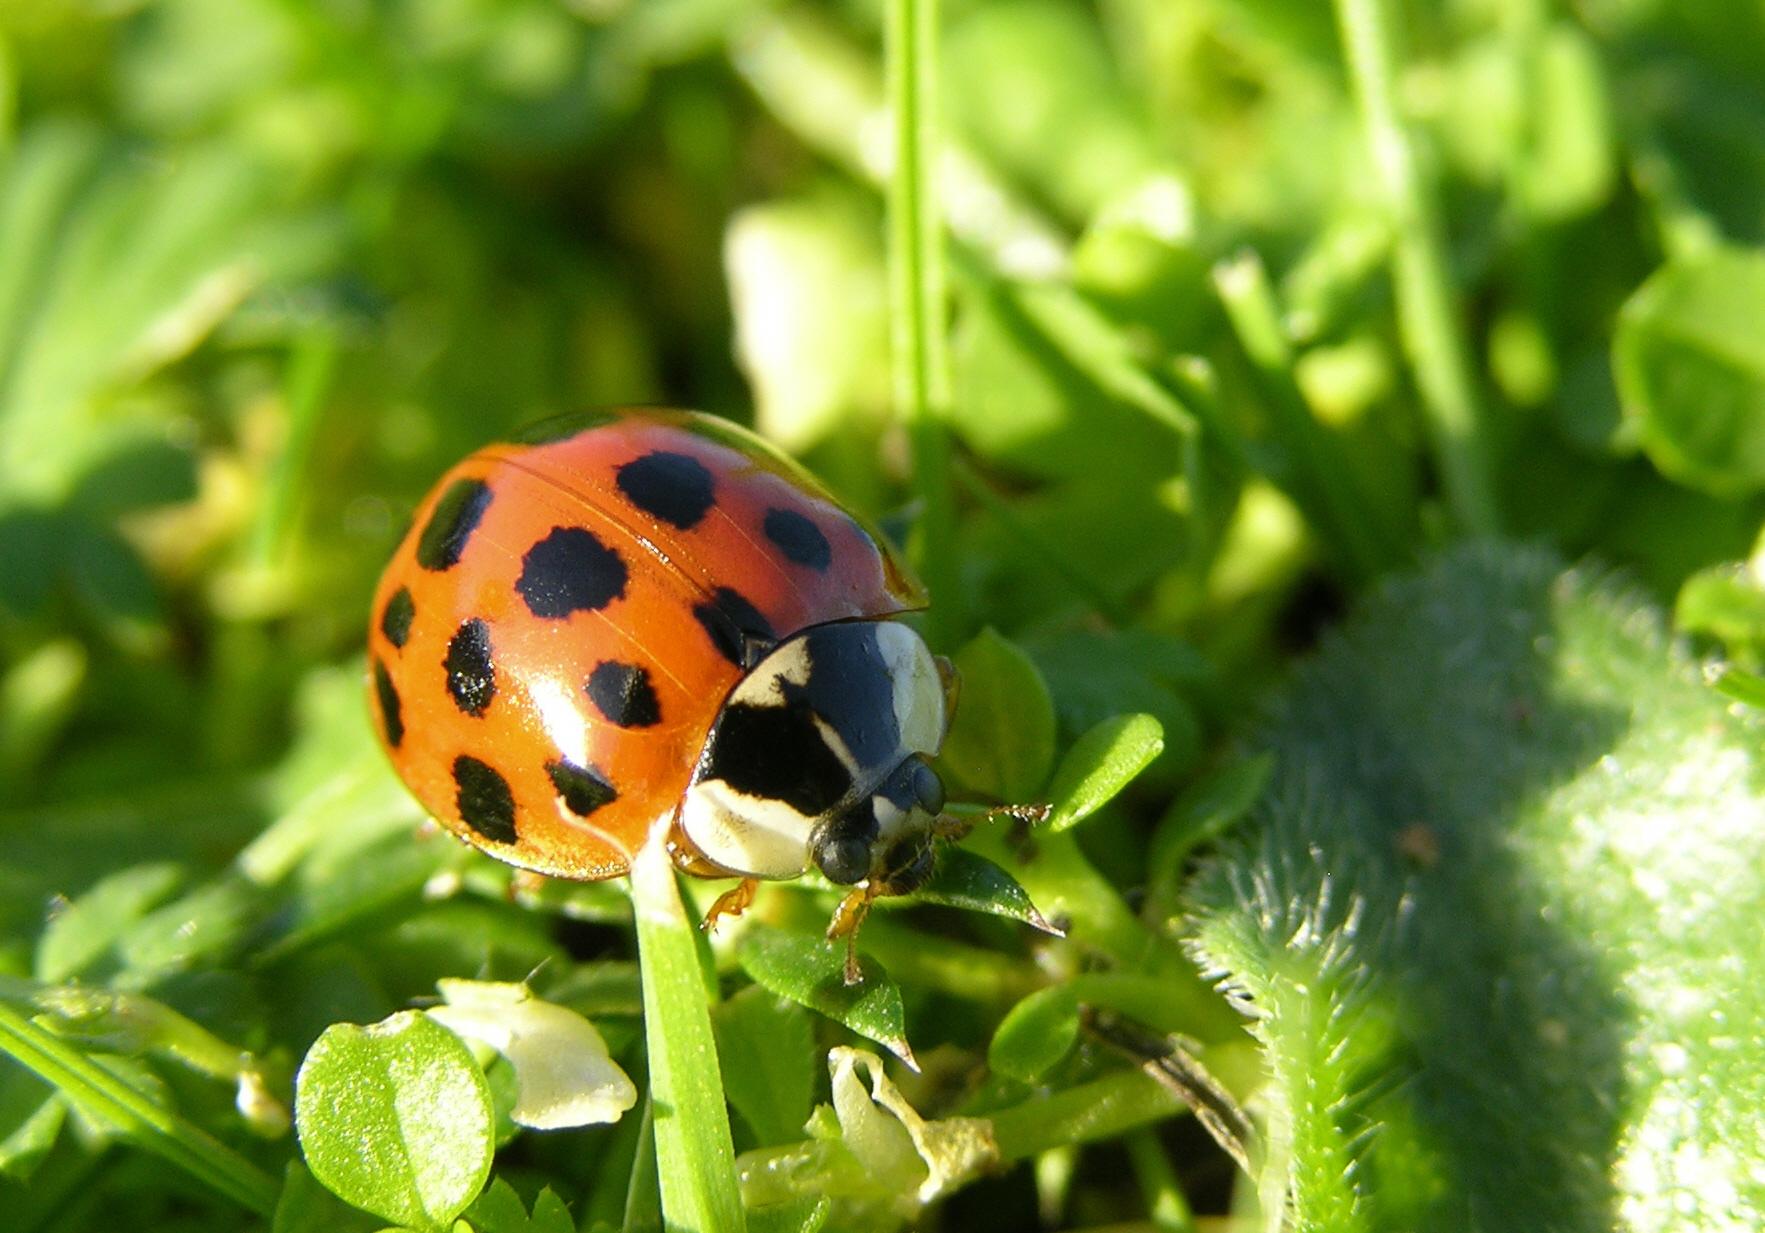 Harlequin ladybird Photo: Jon White